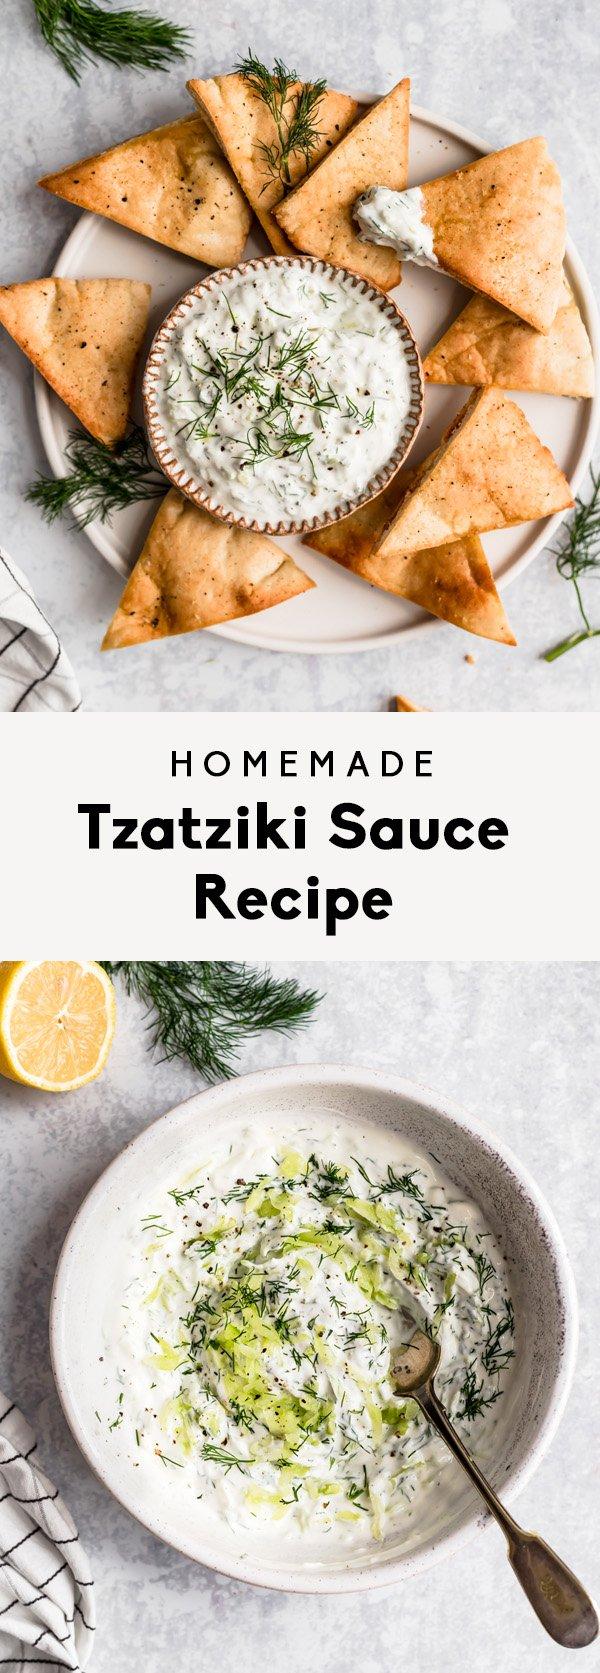 collage of how to make homemade tzatziki sauce